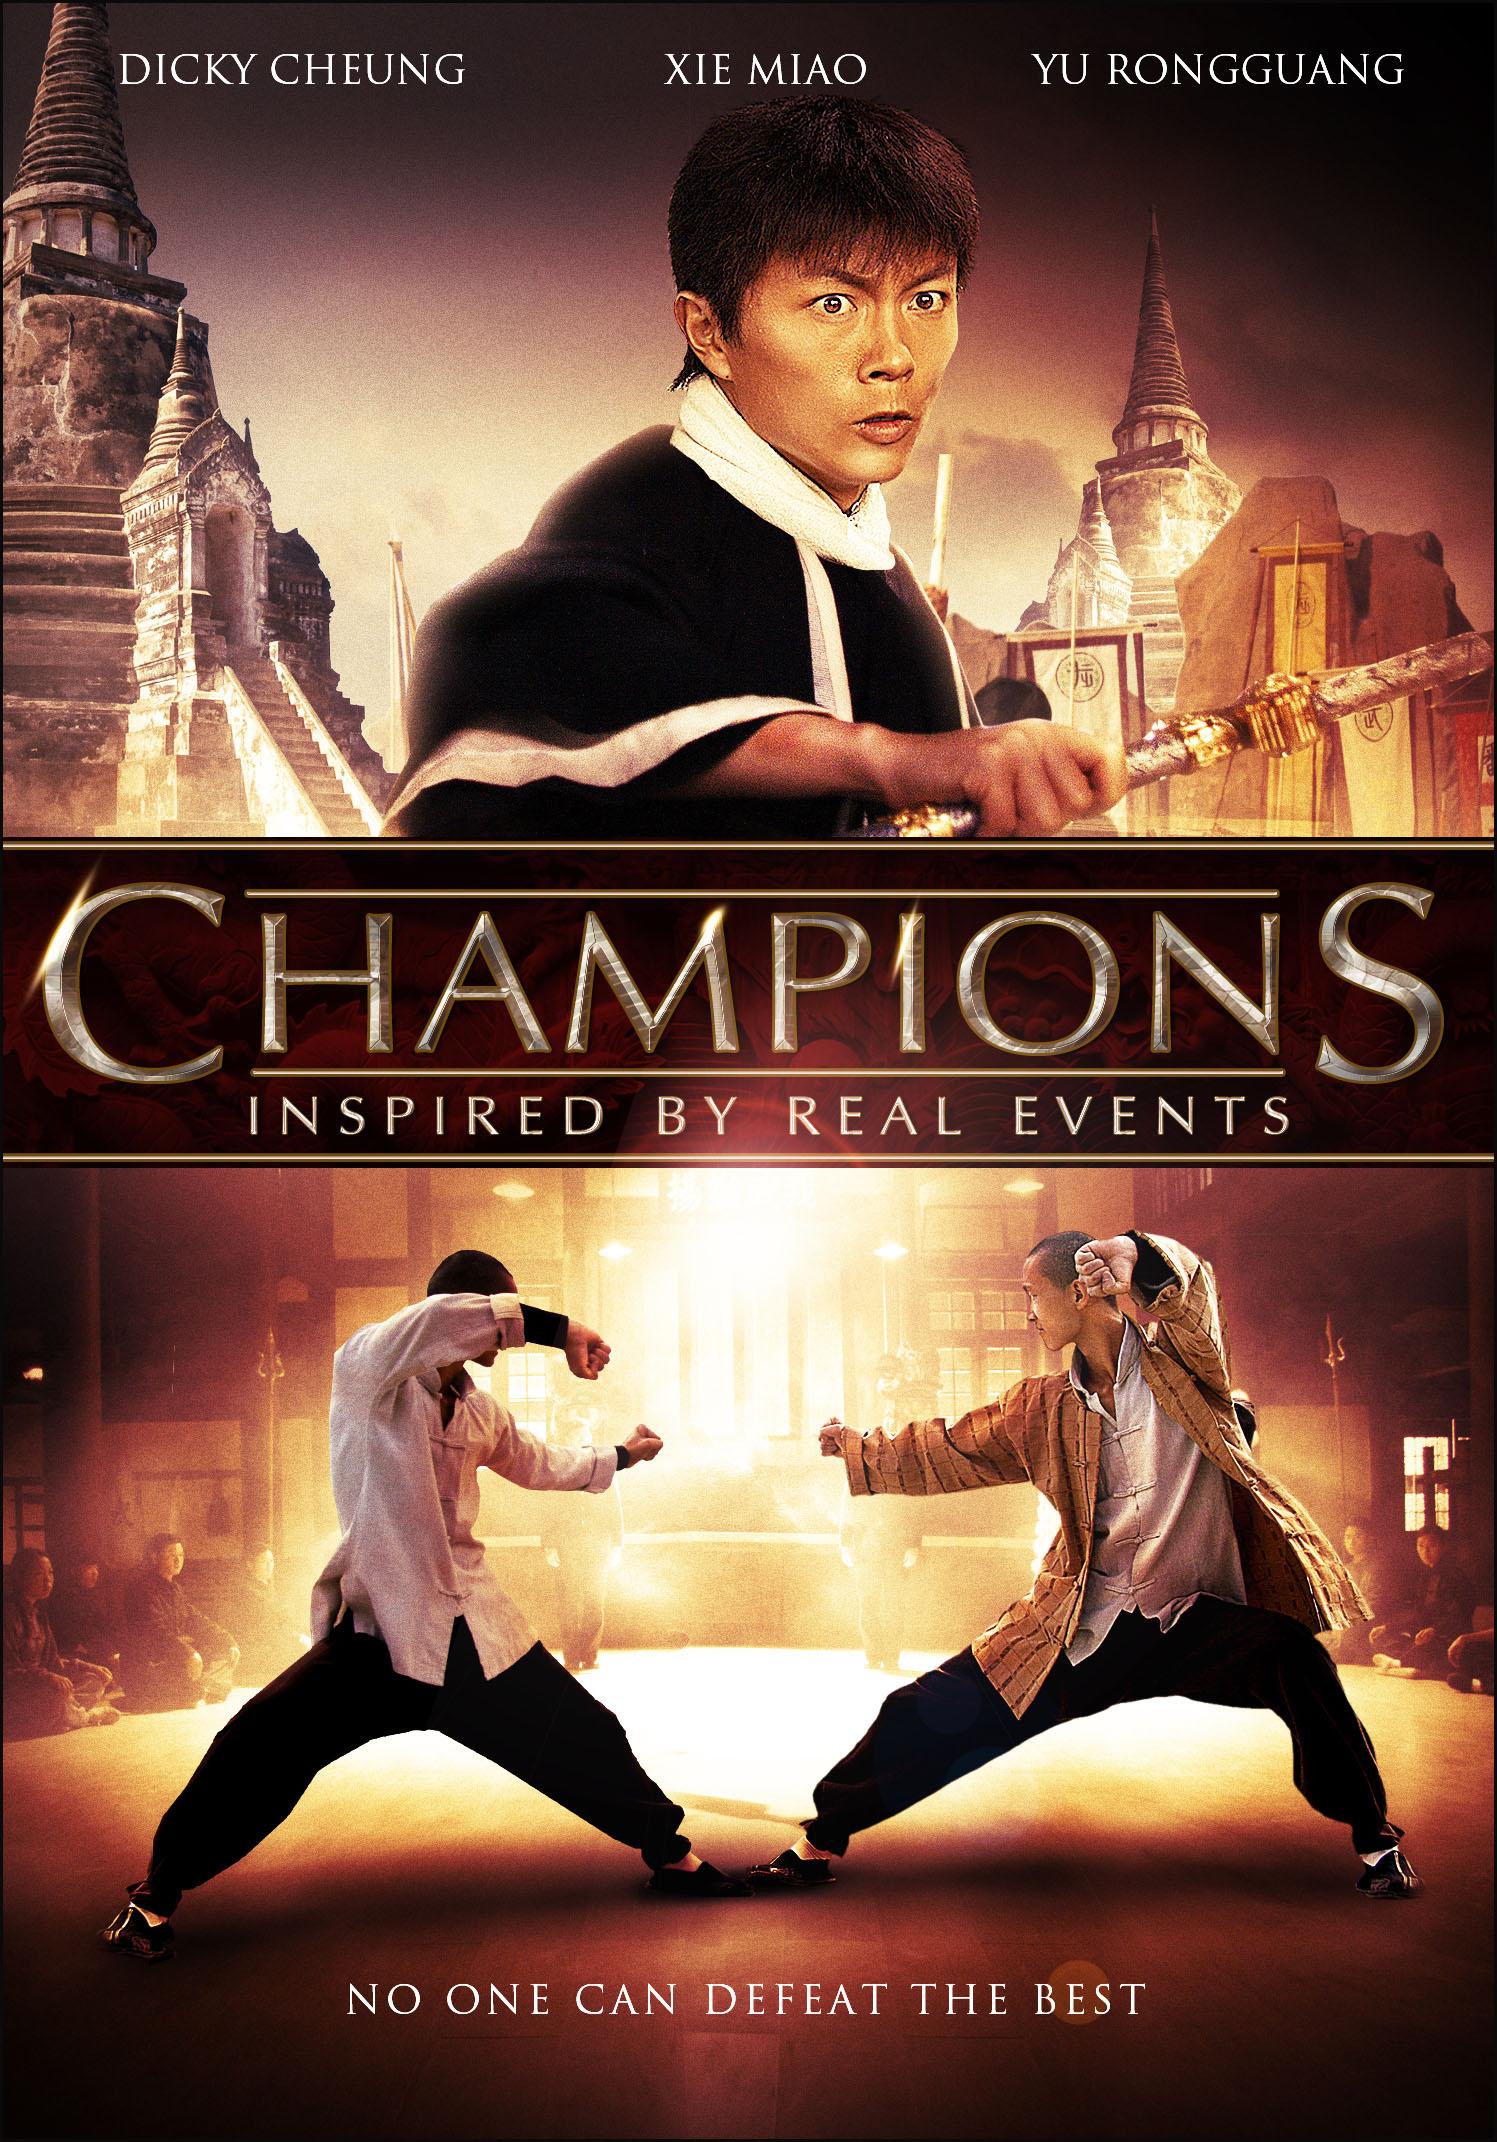 The Champions movie